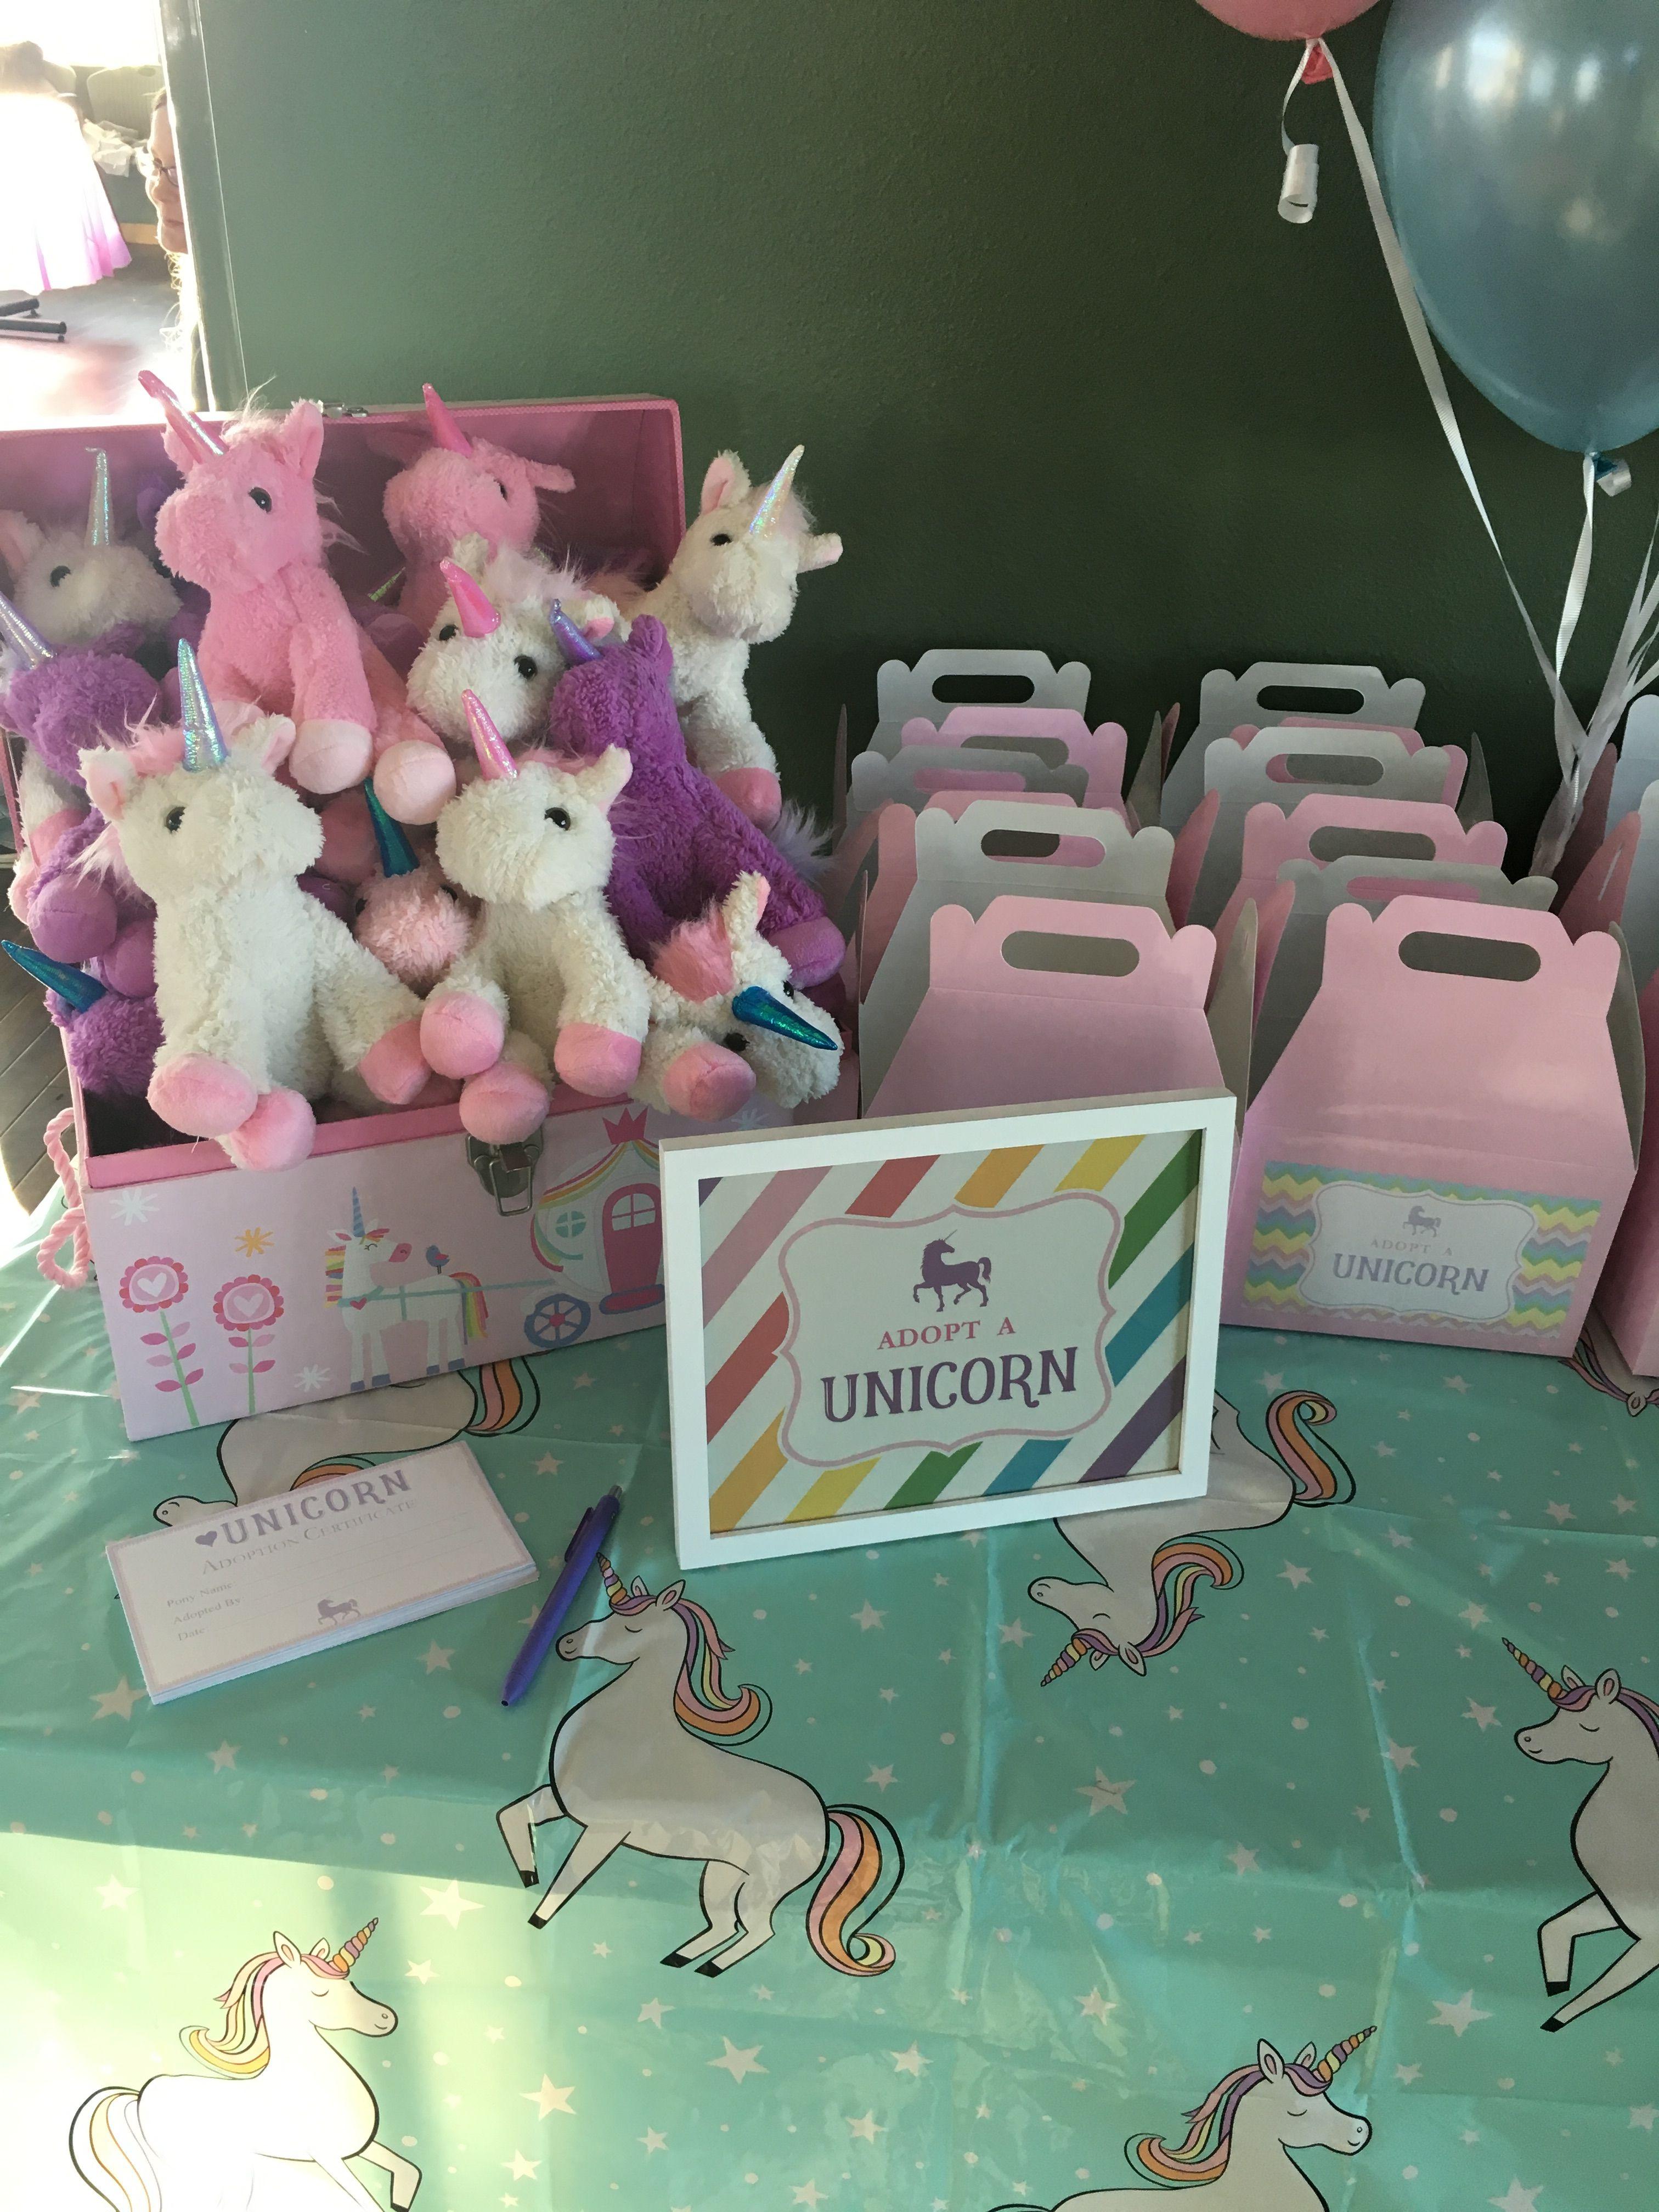 Unicorn party Plush unicorns in a chest from Burlington coat factory